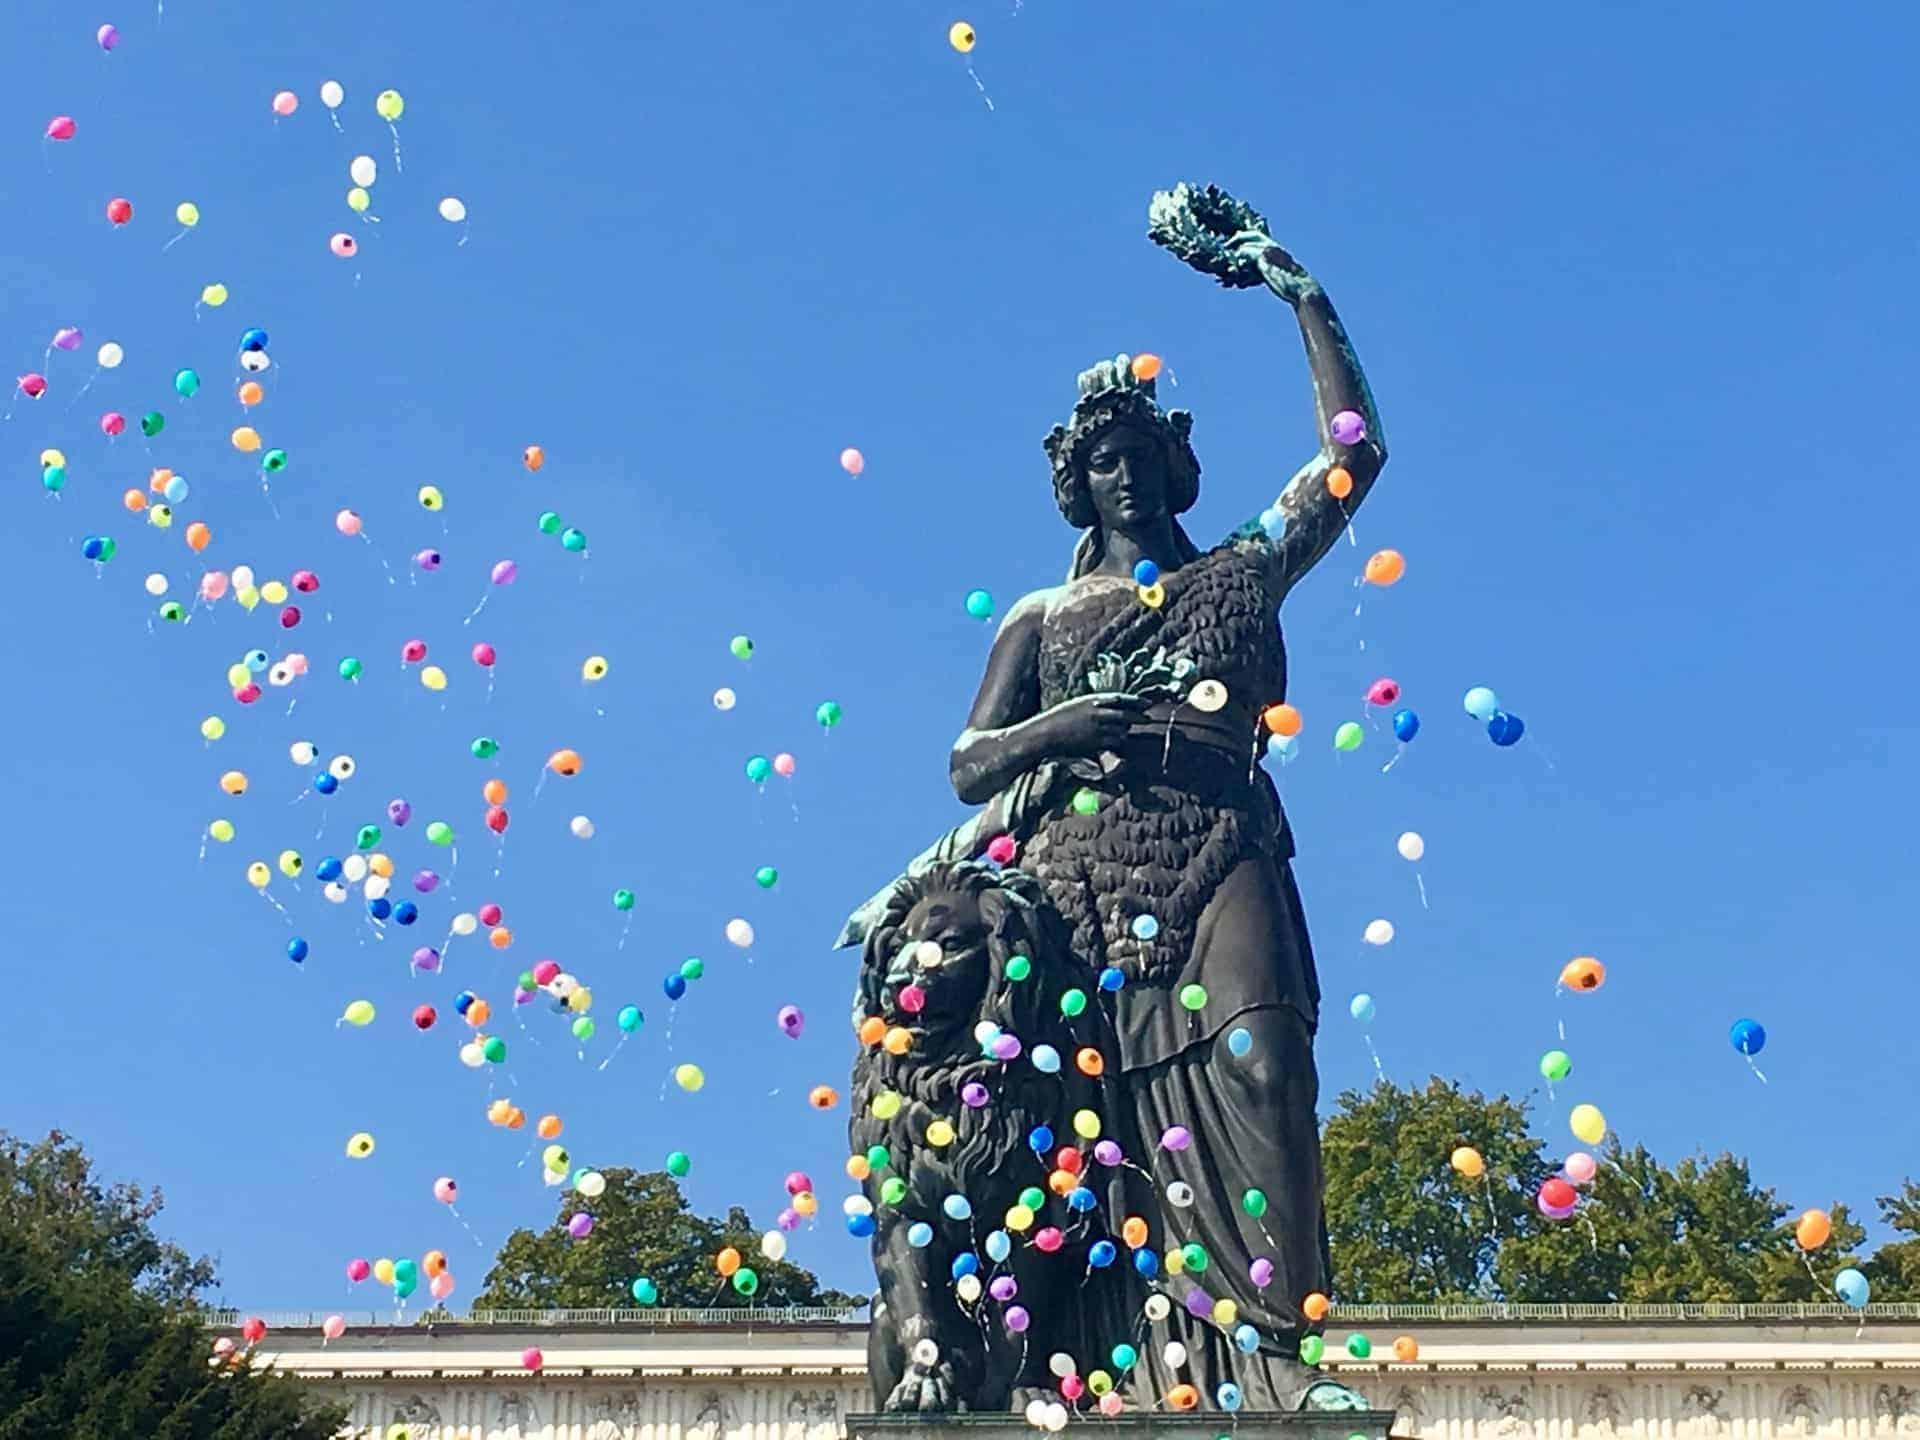 Oktoberfest_Wiesn_Bavaria_Luftballons